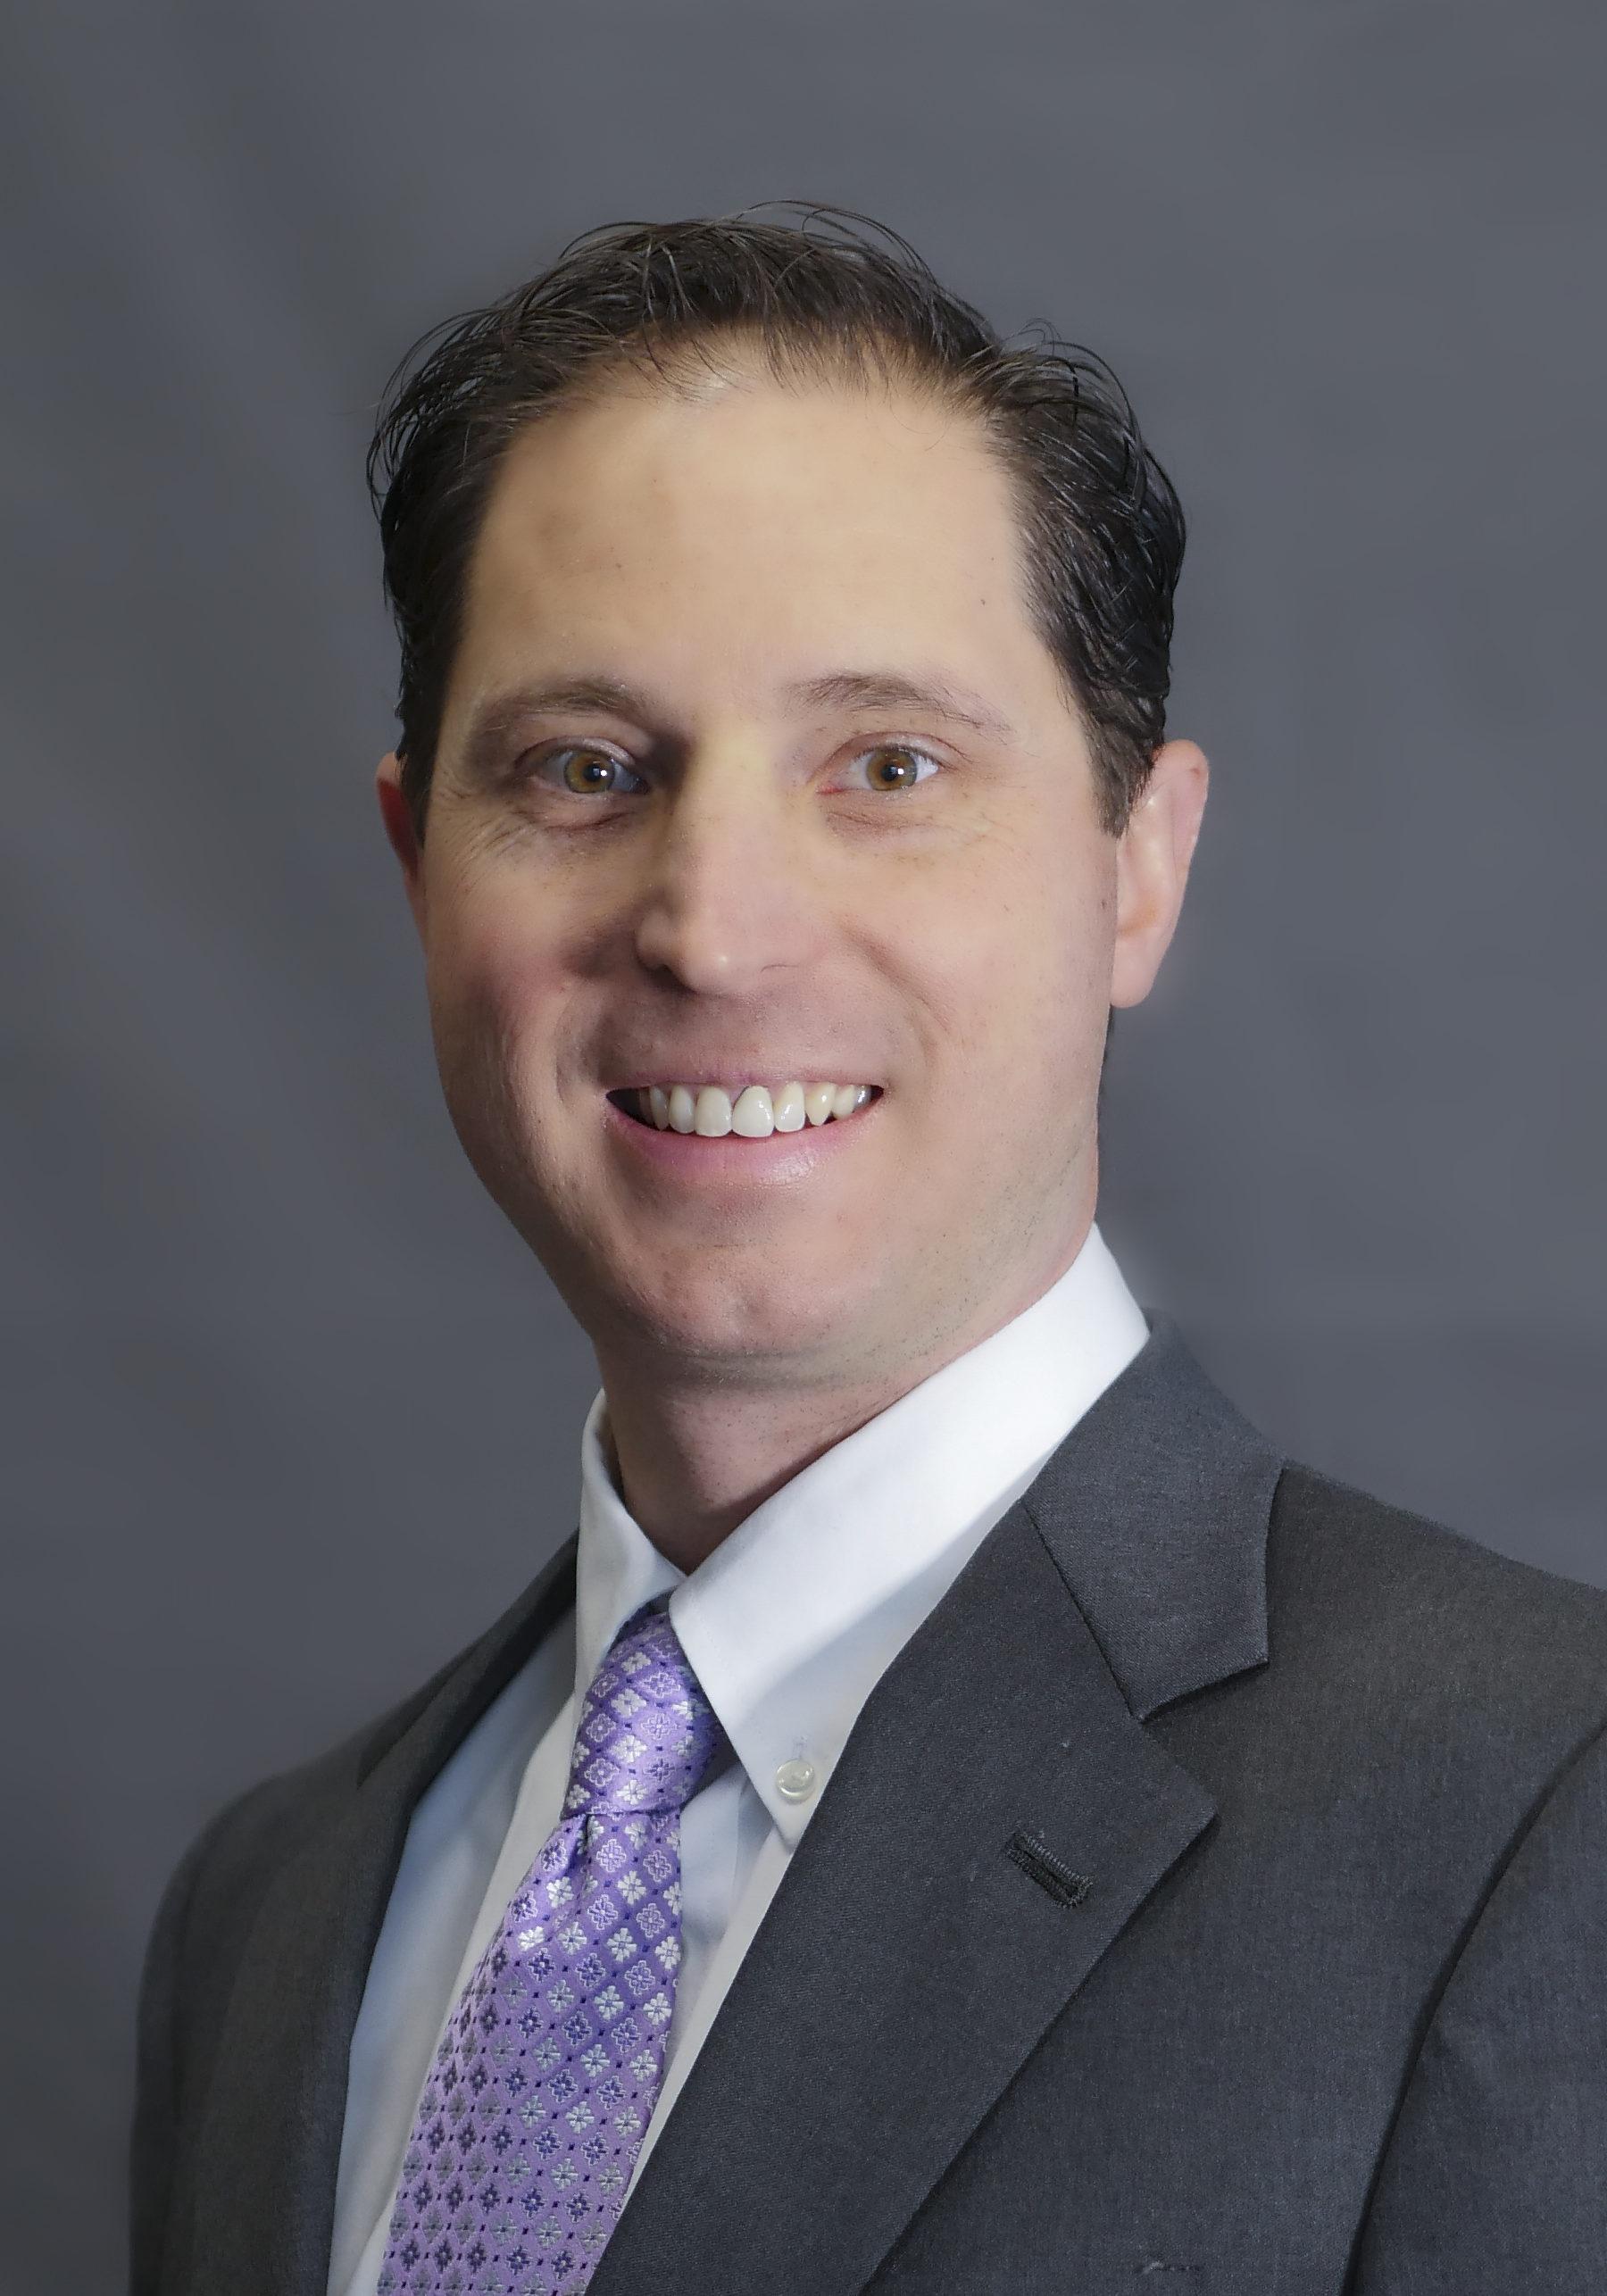 Tim Lynch, Senior Vice President